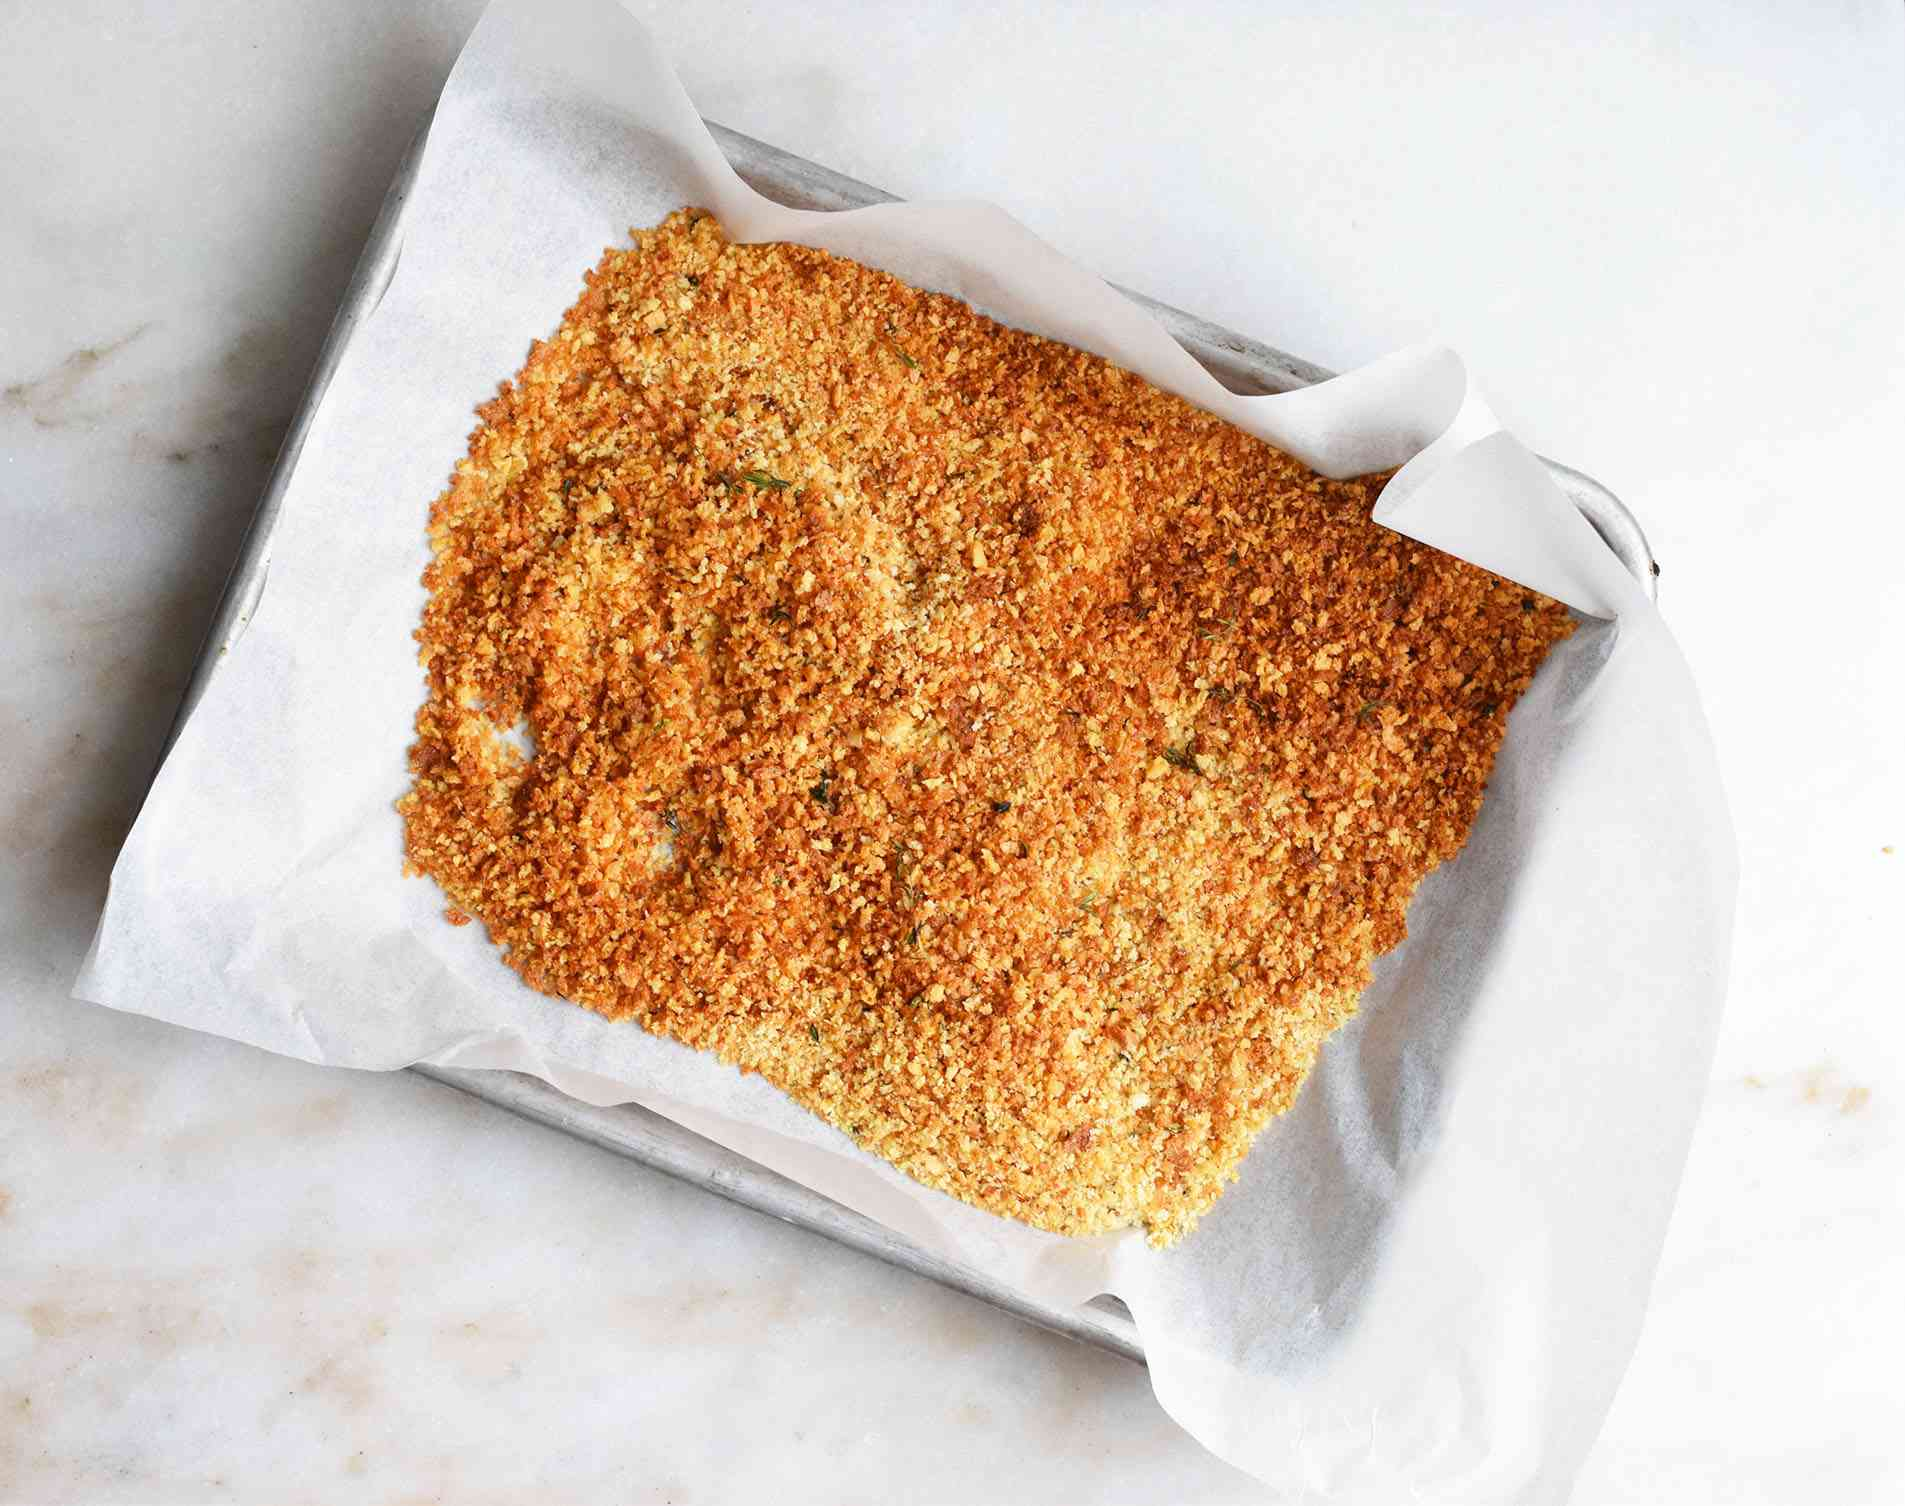 toasted Panko bread crumbs on a sheet pan